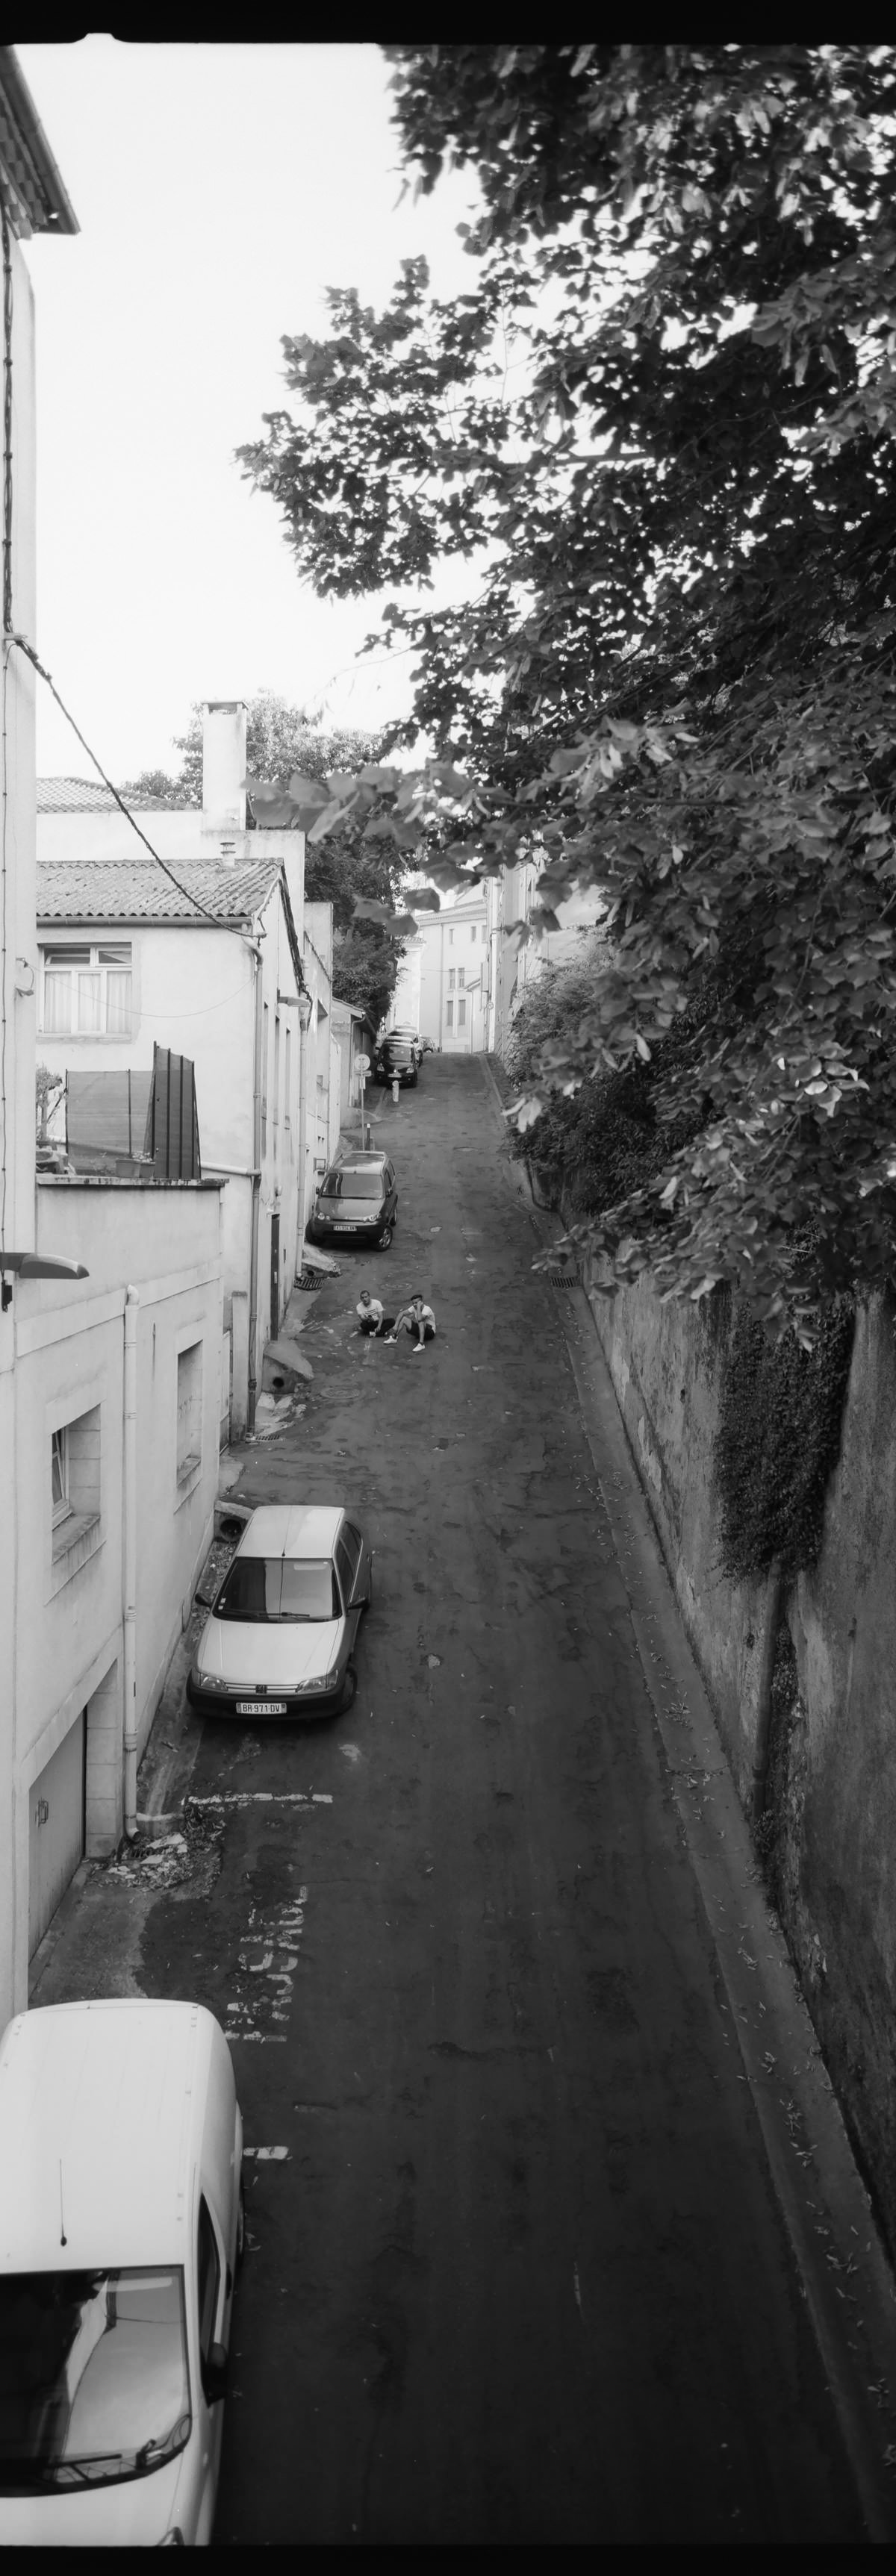 Southern France Streets france street photography on hasselbald xpan 45mm on kodak trix 400